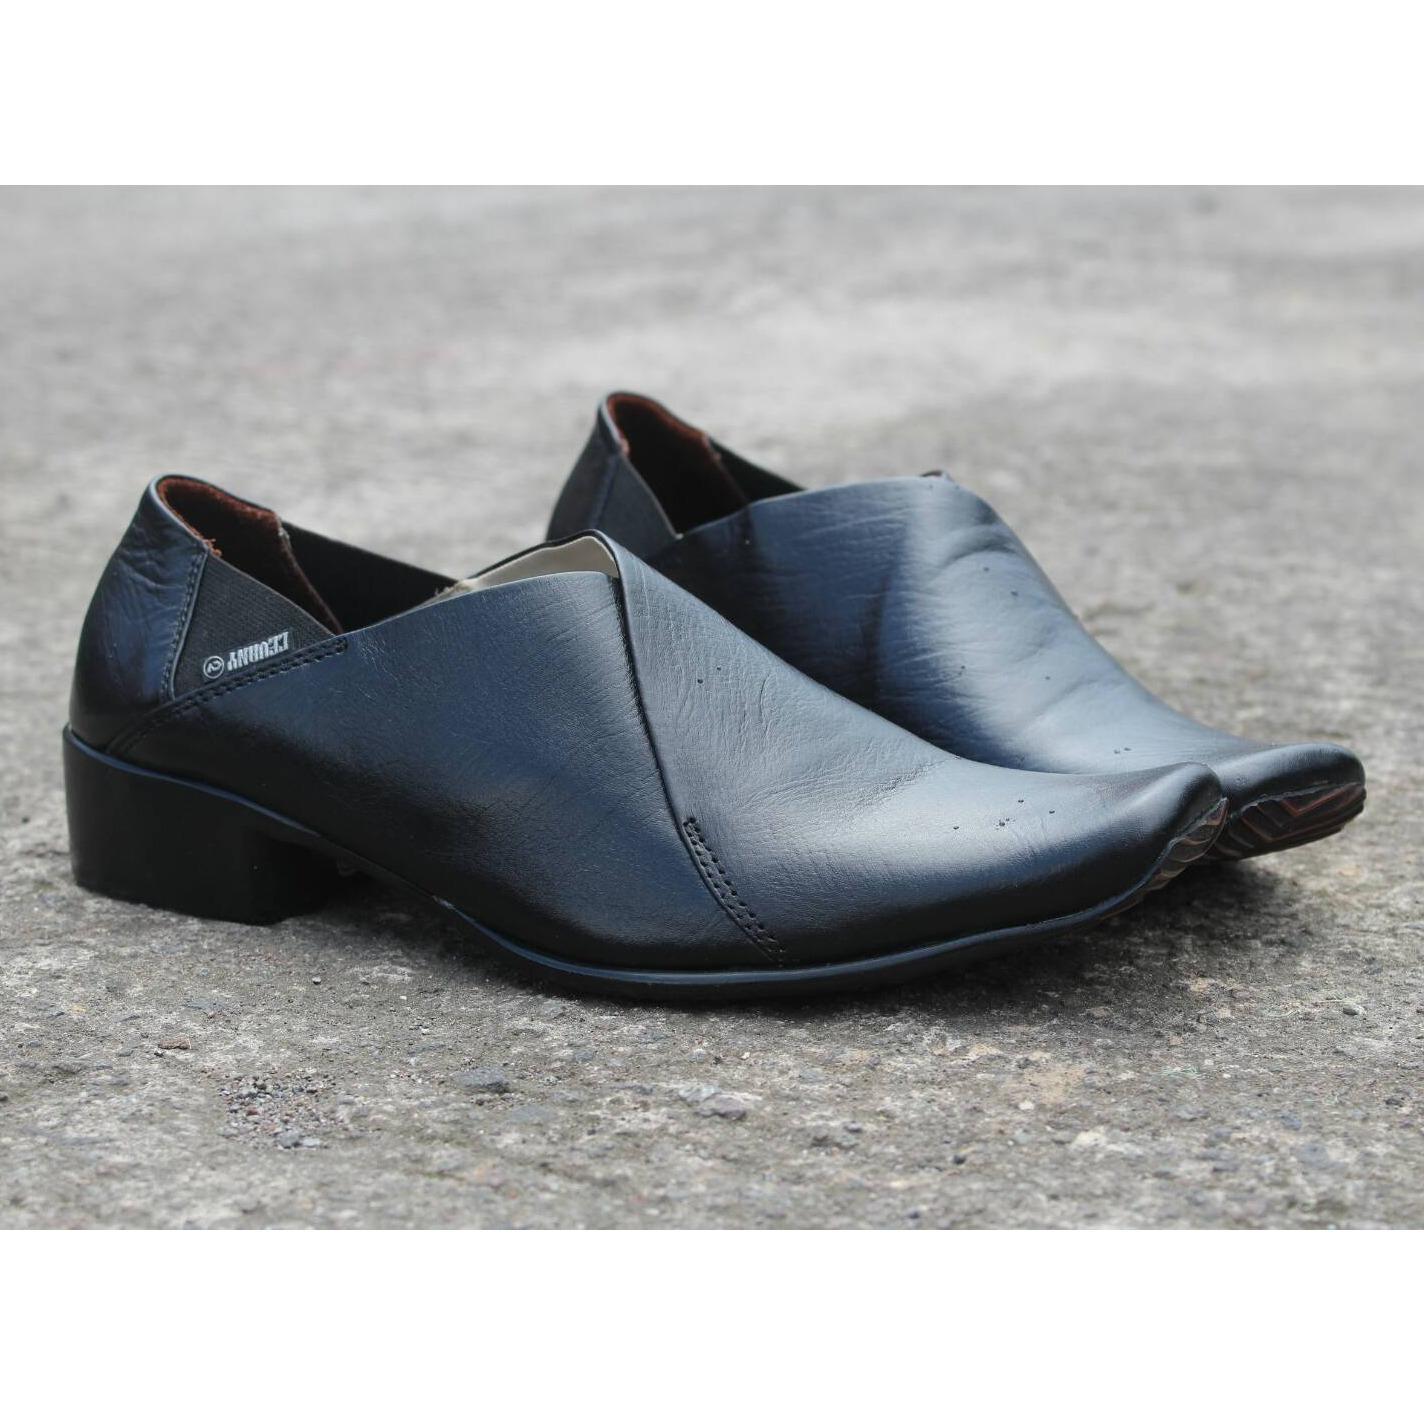 Sepatu Pantofel Pria Formal   Kerja   Kantor Kulit Asli Sol Fiber Modern -  CEVANY KIMONO c811149ed7